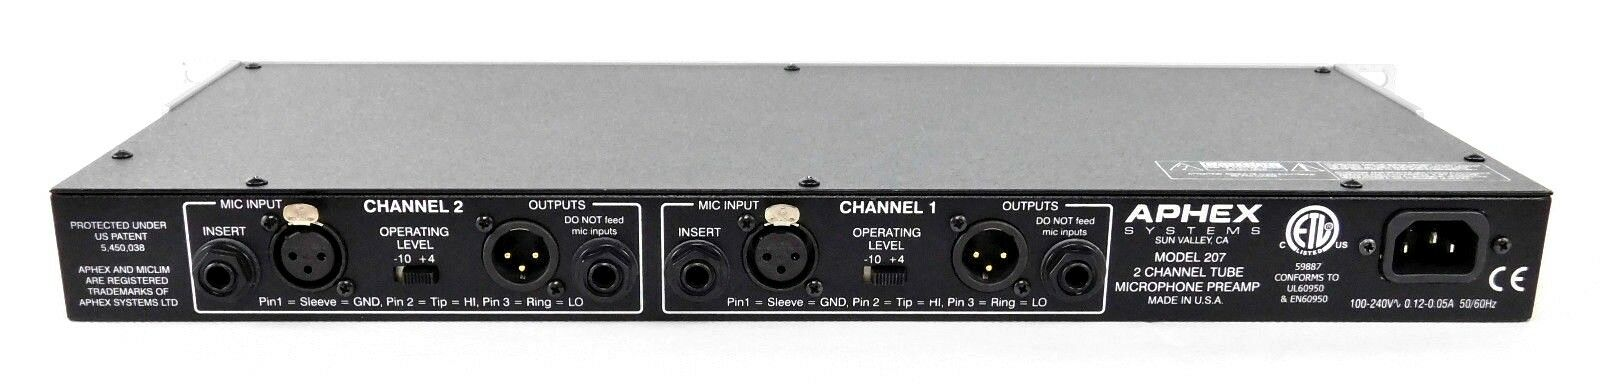 Aphex 207 207 Aphex dual Tube MIC preamp tubos preamp made in usa + factura & garantía c99a20